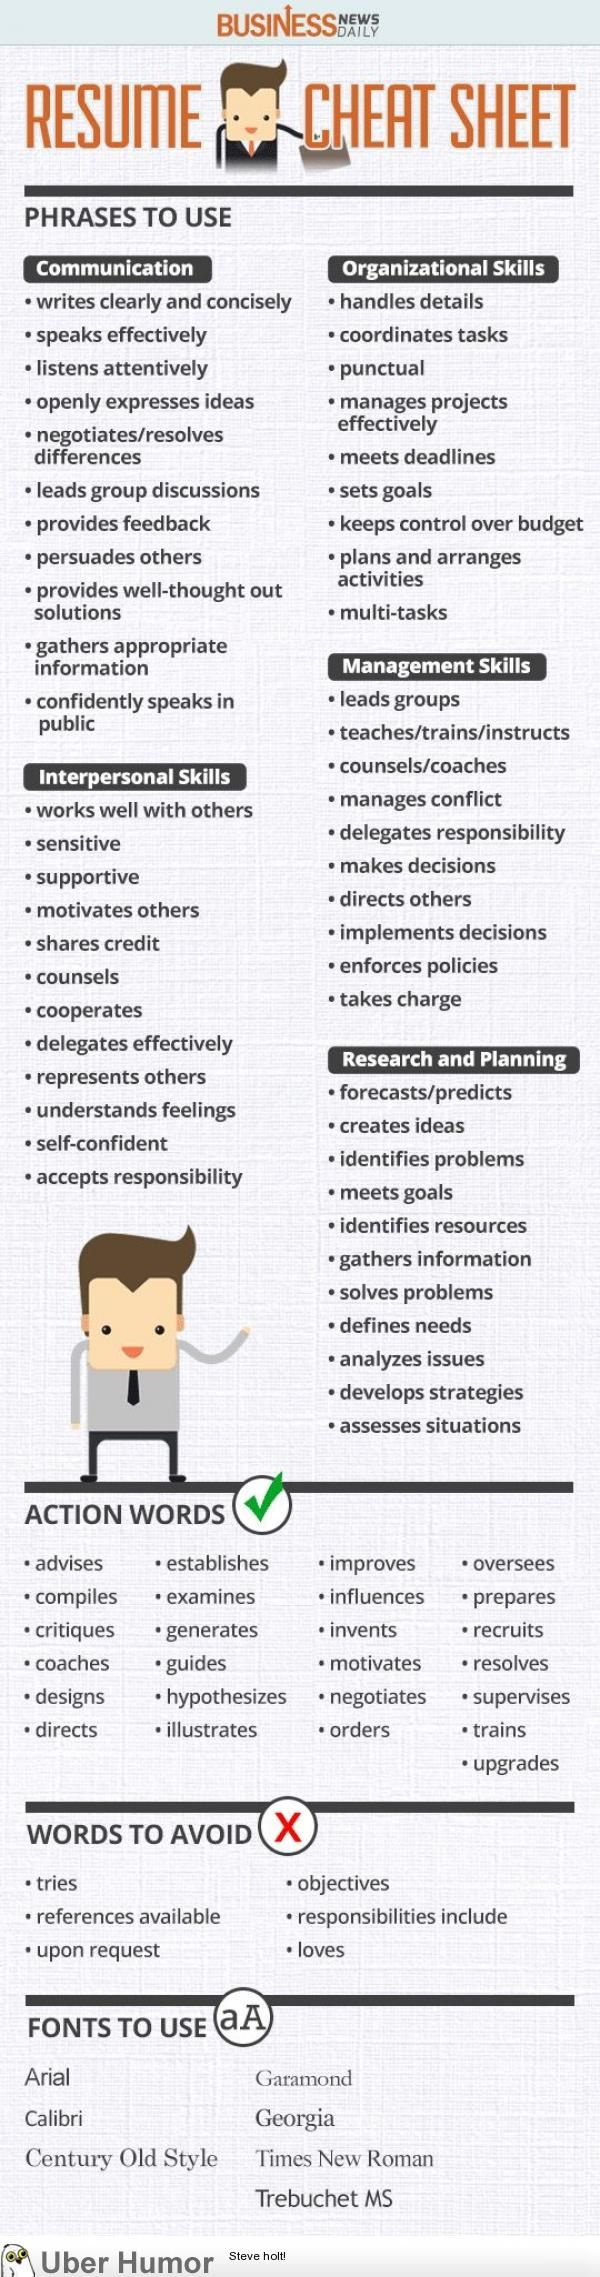 Resume Trigger Words Resume Cheat Sheet  Job Search  Pinterest